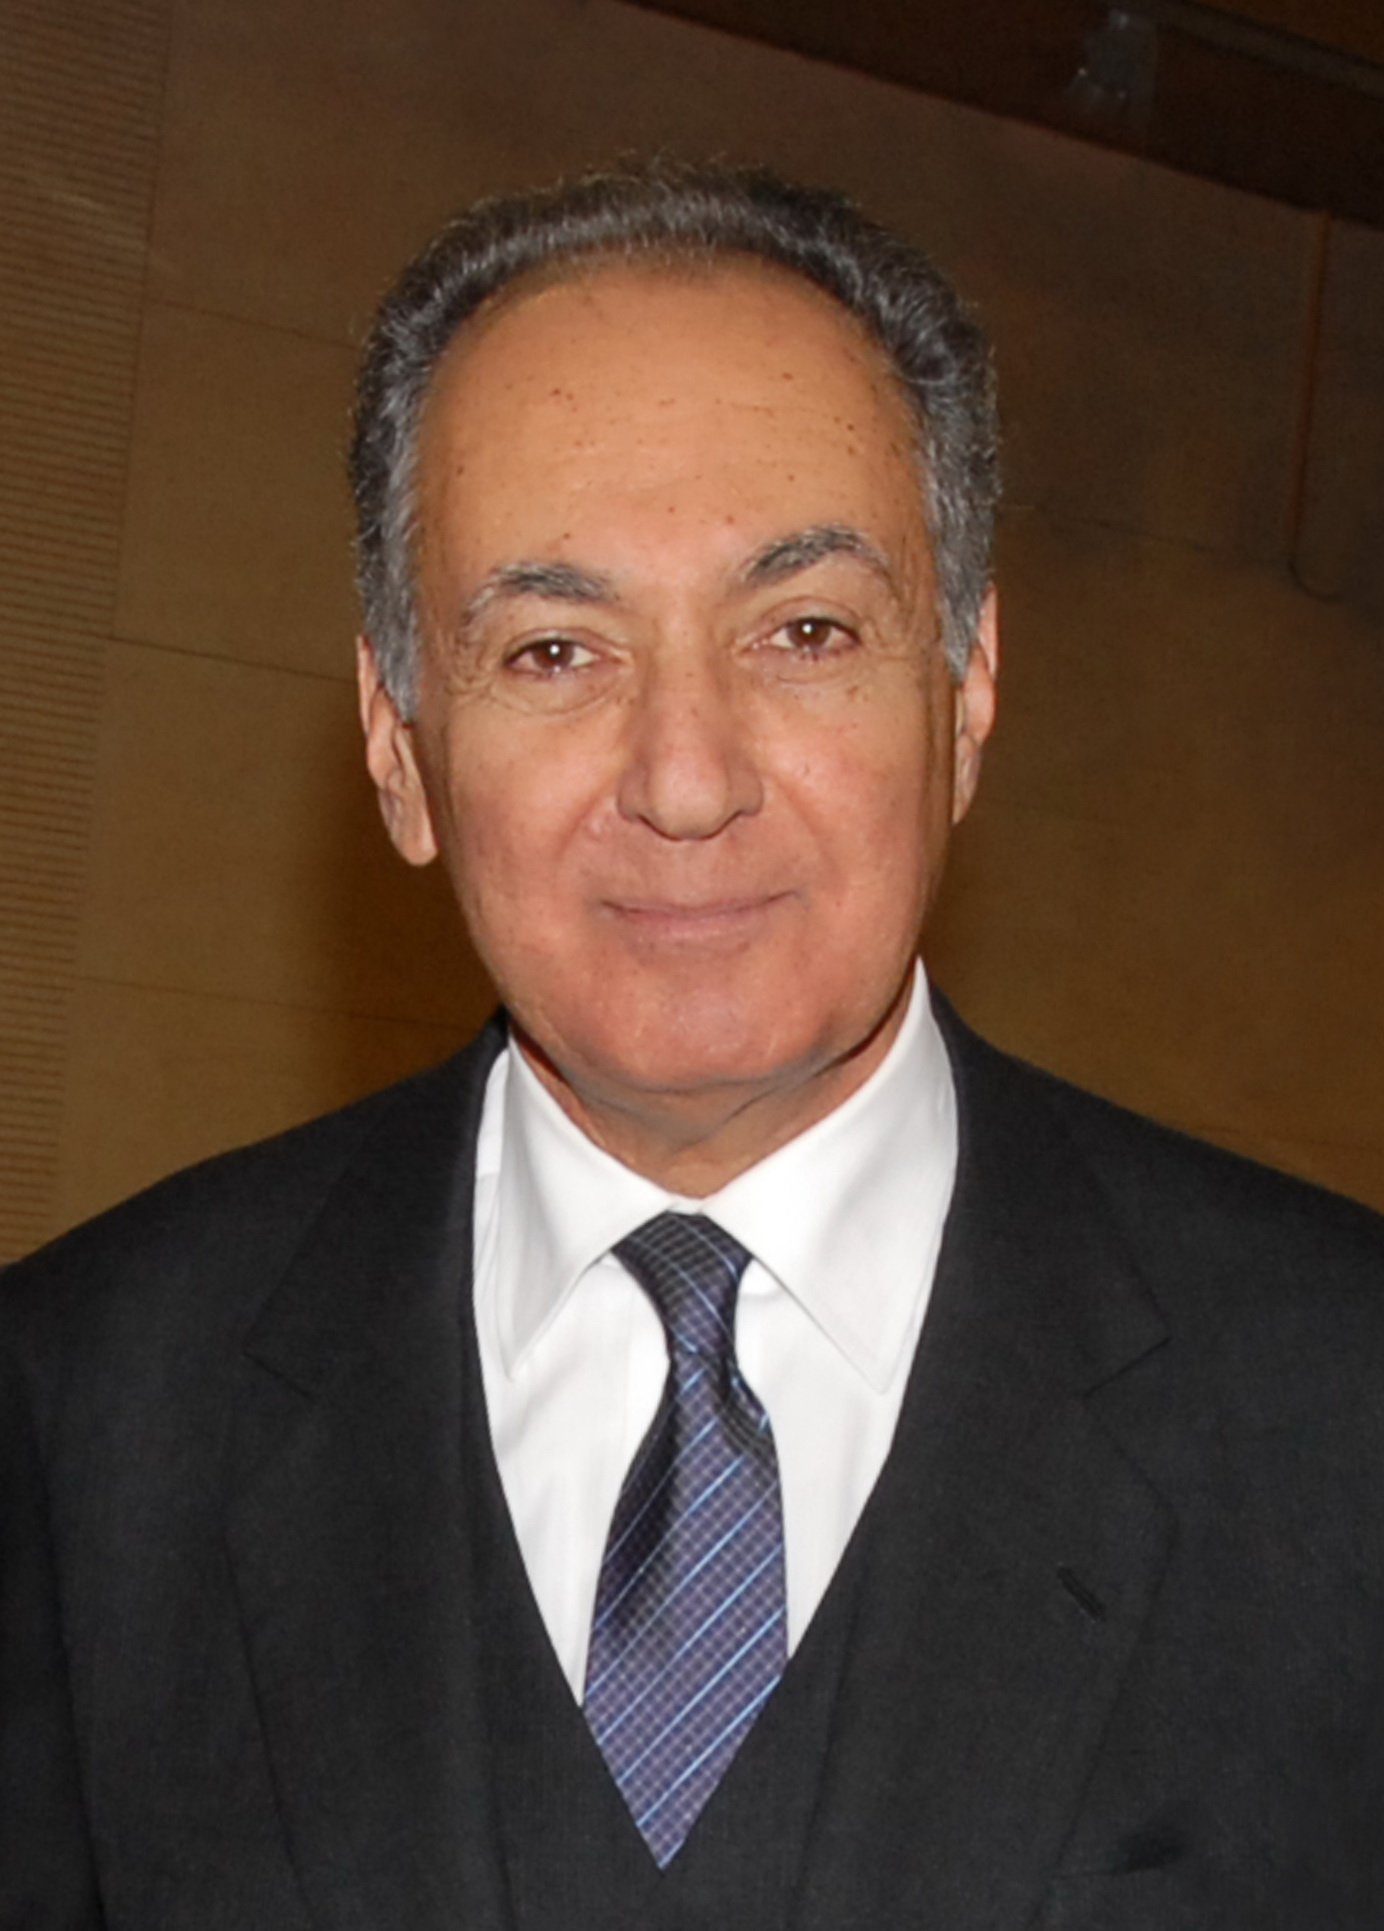 Prof. Kitromilides